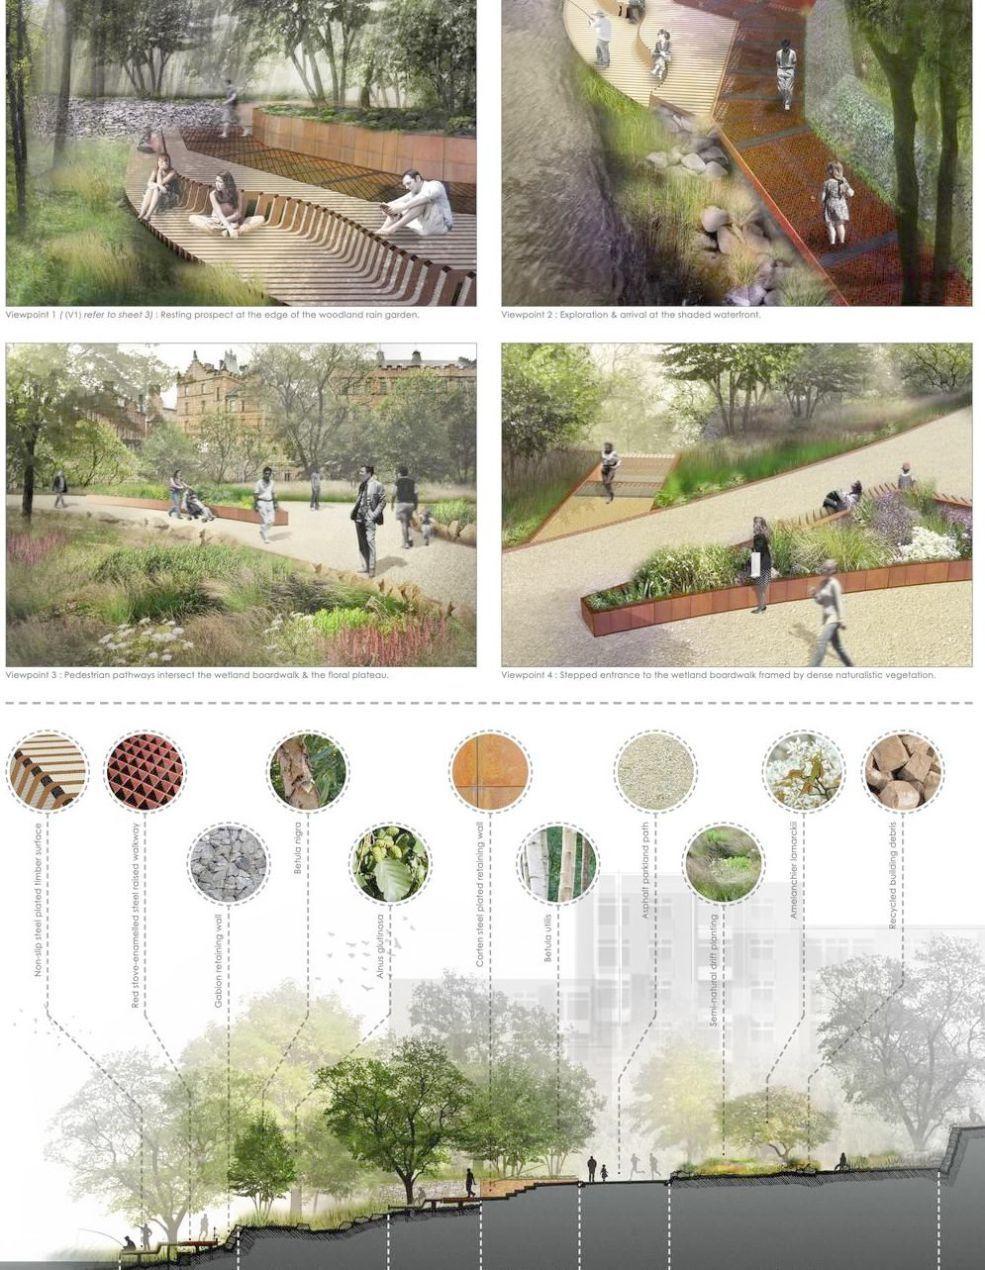 Urban Landscape Sketches from Urban Roots Community Garden